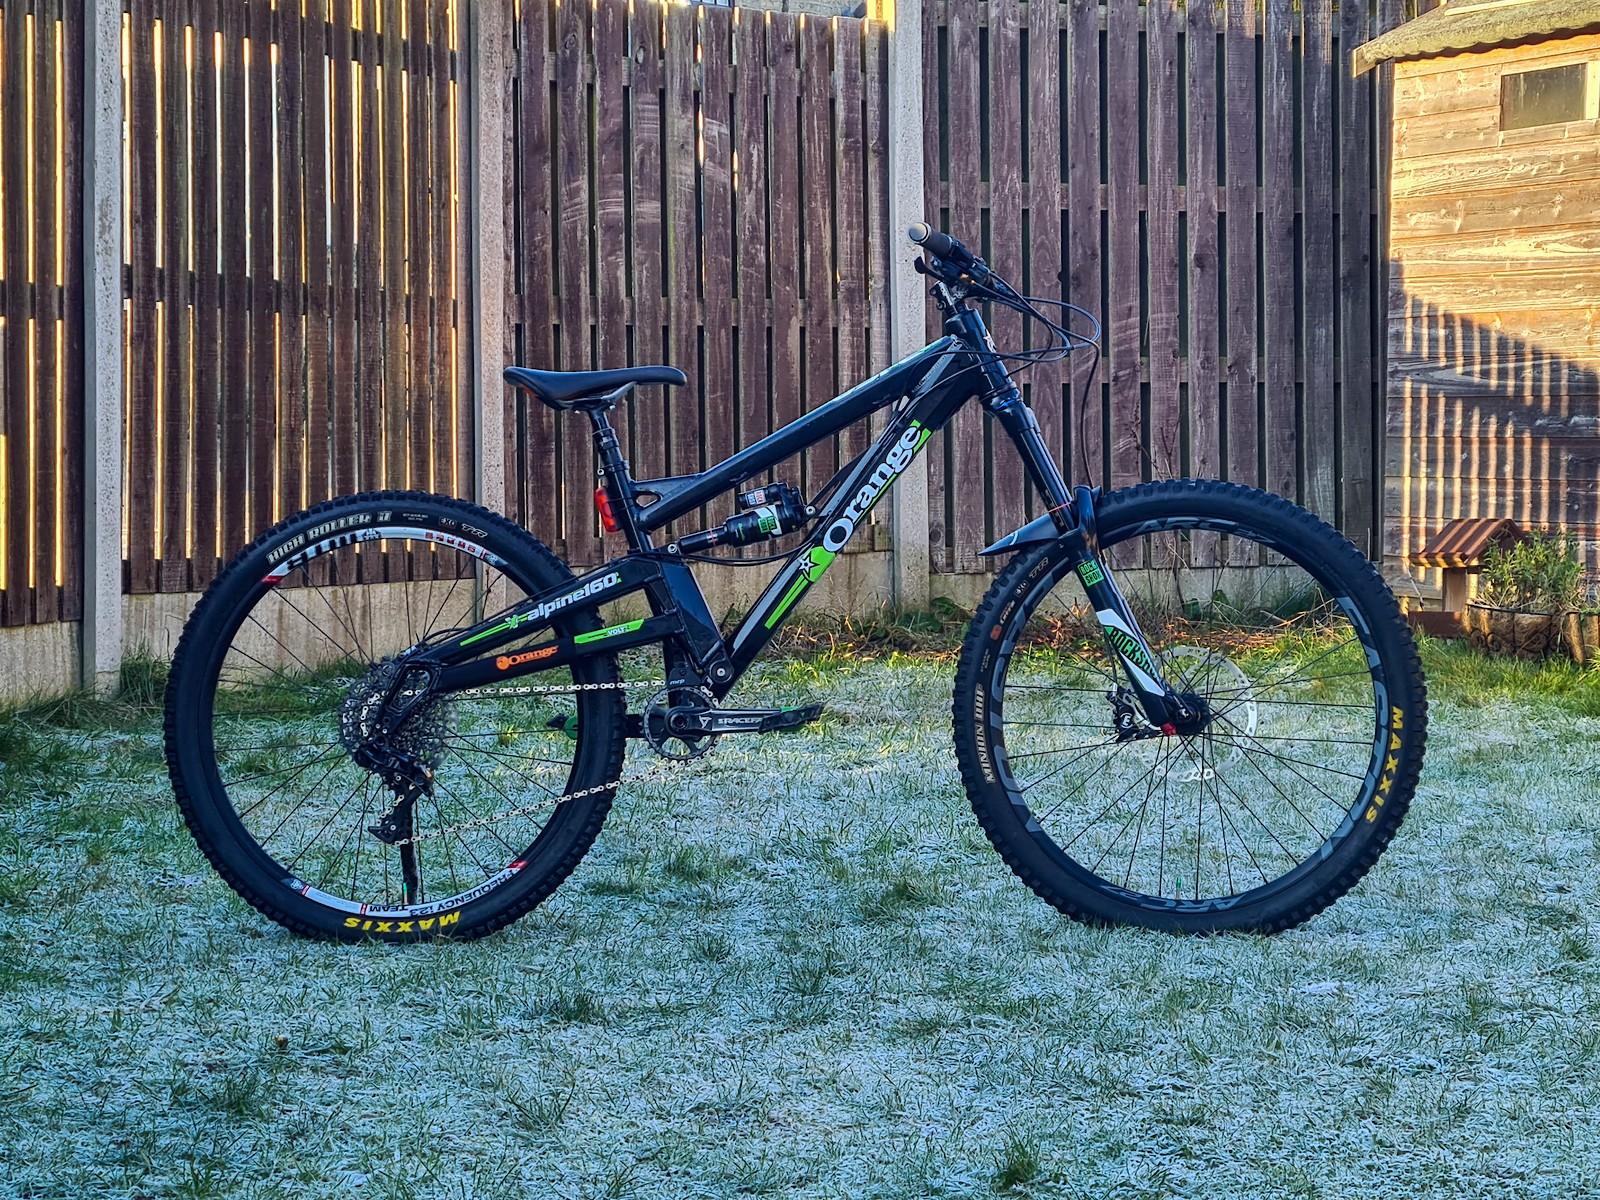 Orange Alpine 160 - Vital Bike of the Day January 2021 - Mountain Biking Pictures - Vital MTB